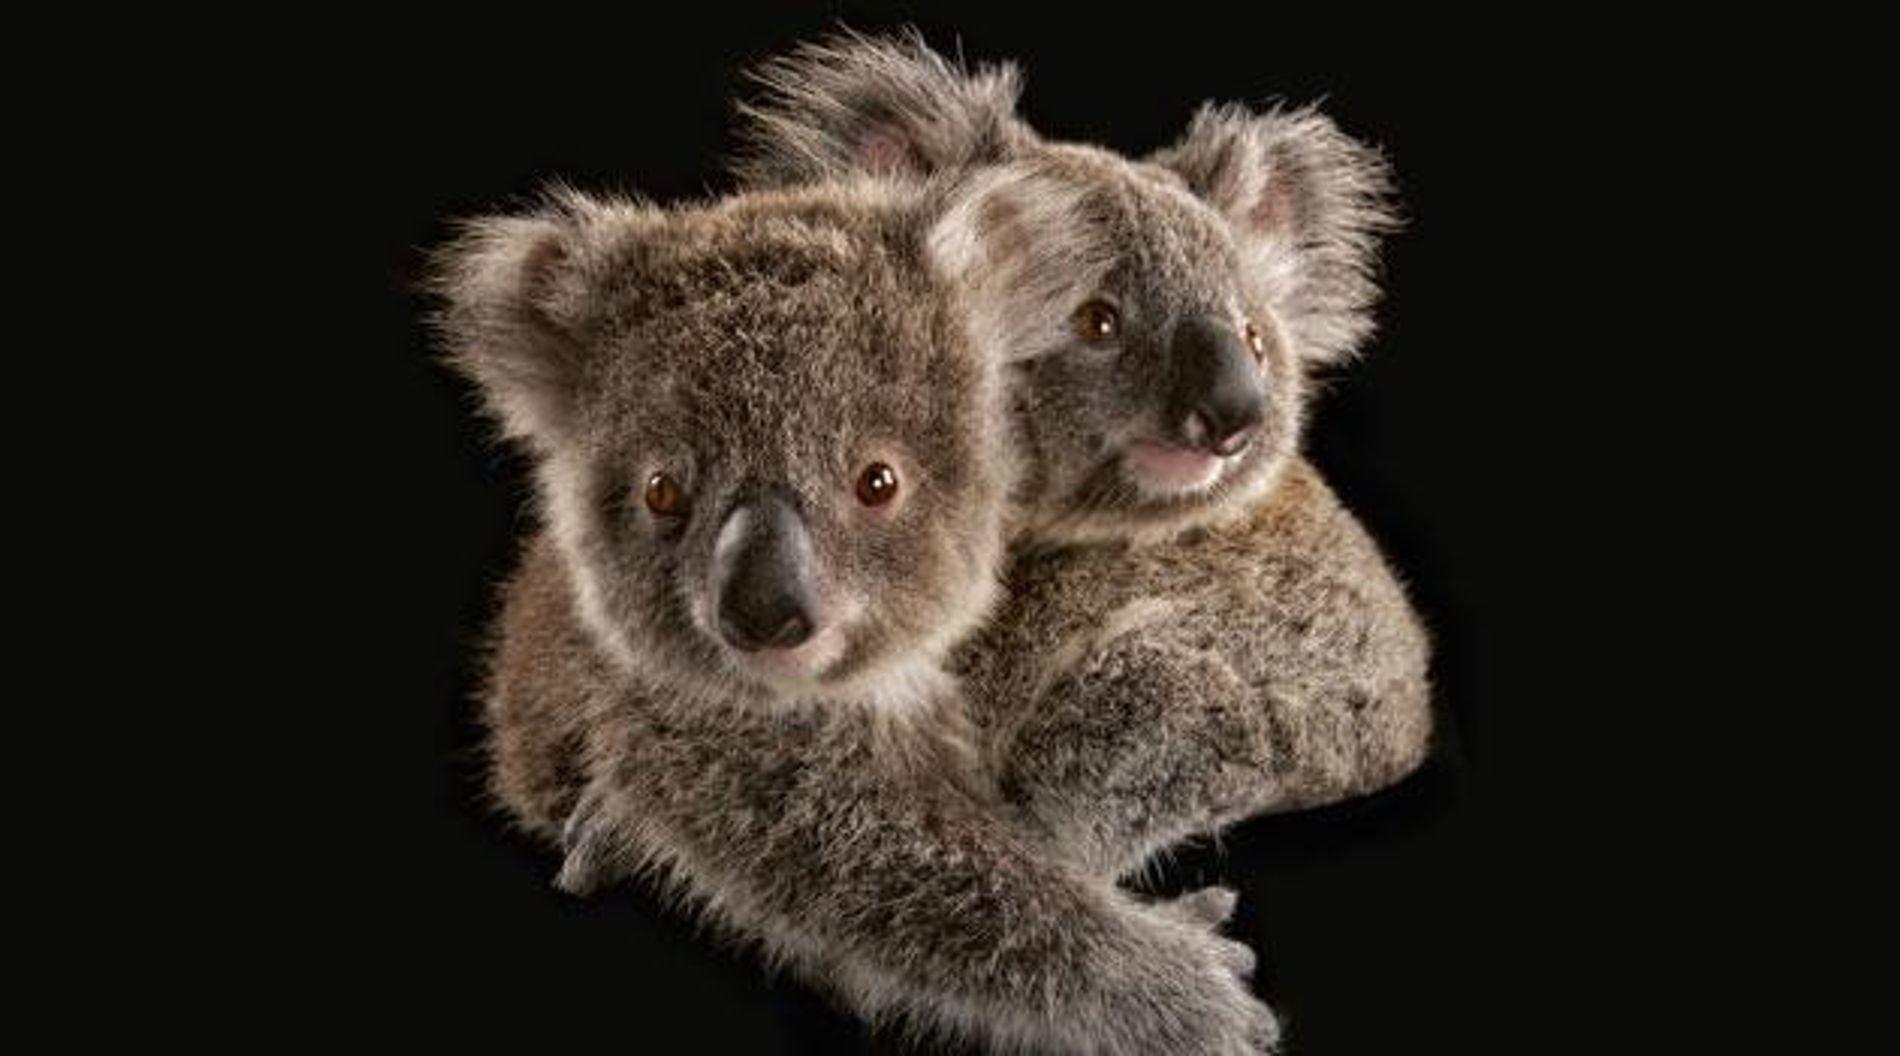 Bedrohte Koalas: Kleiner Bär – was nun?